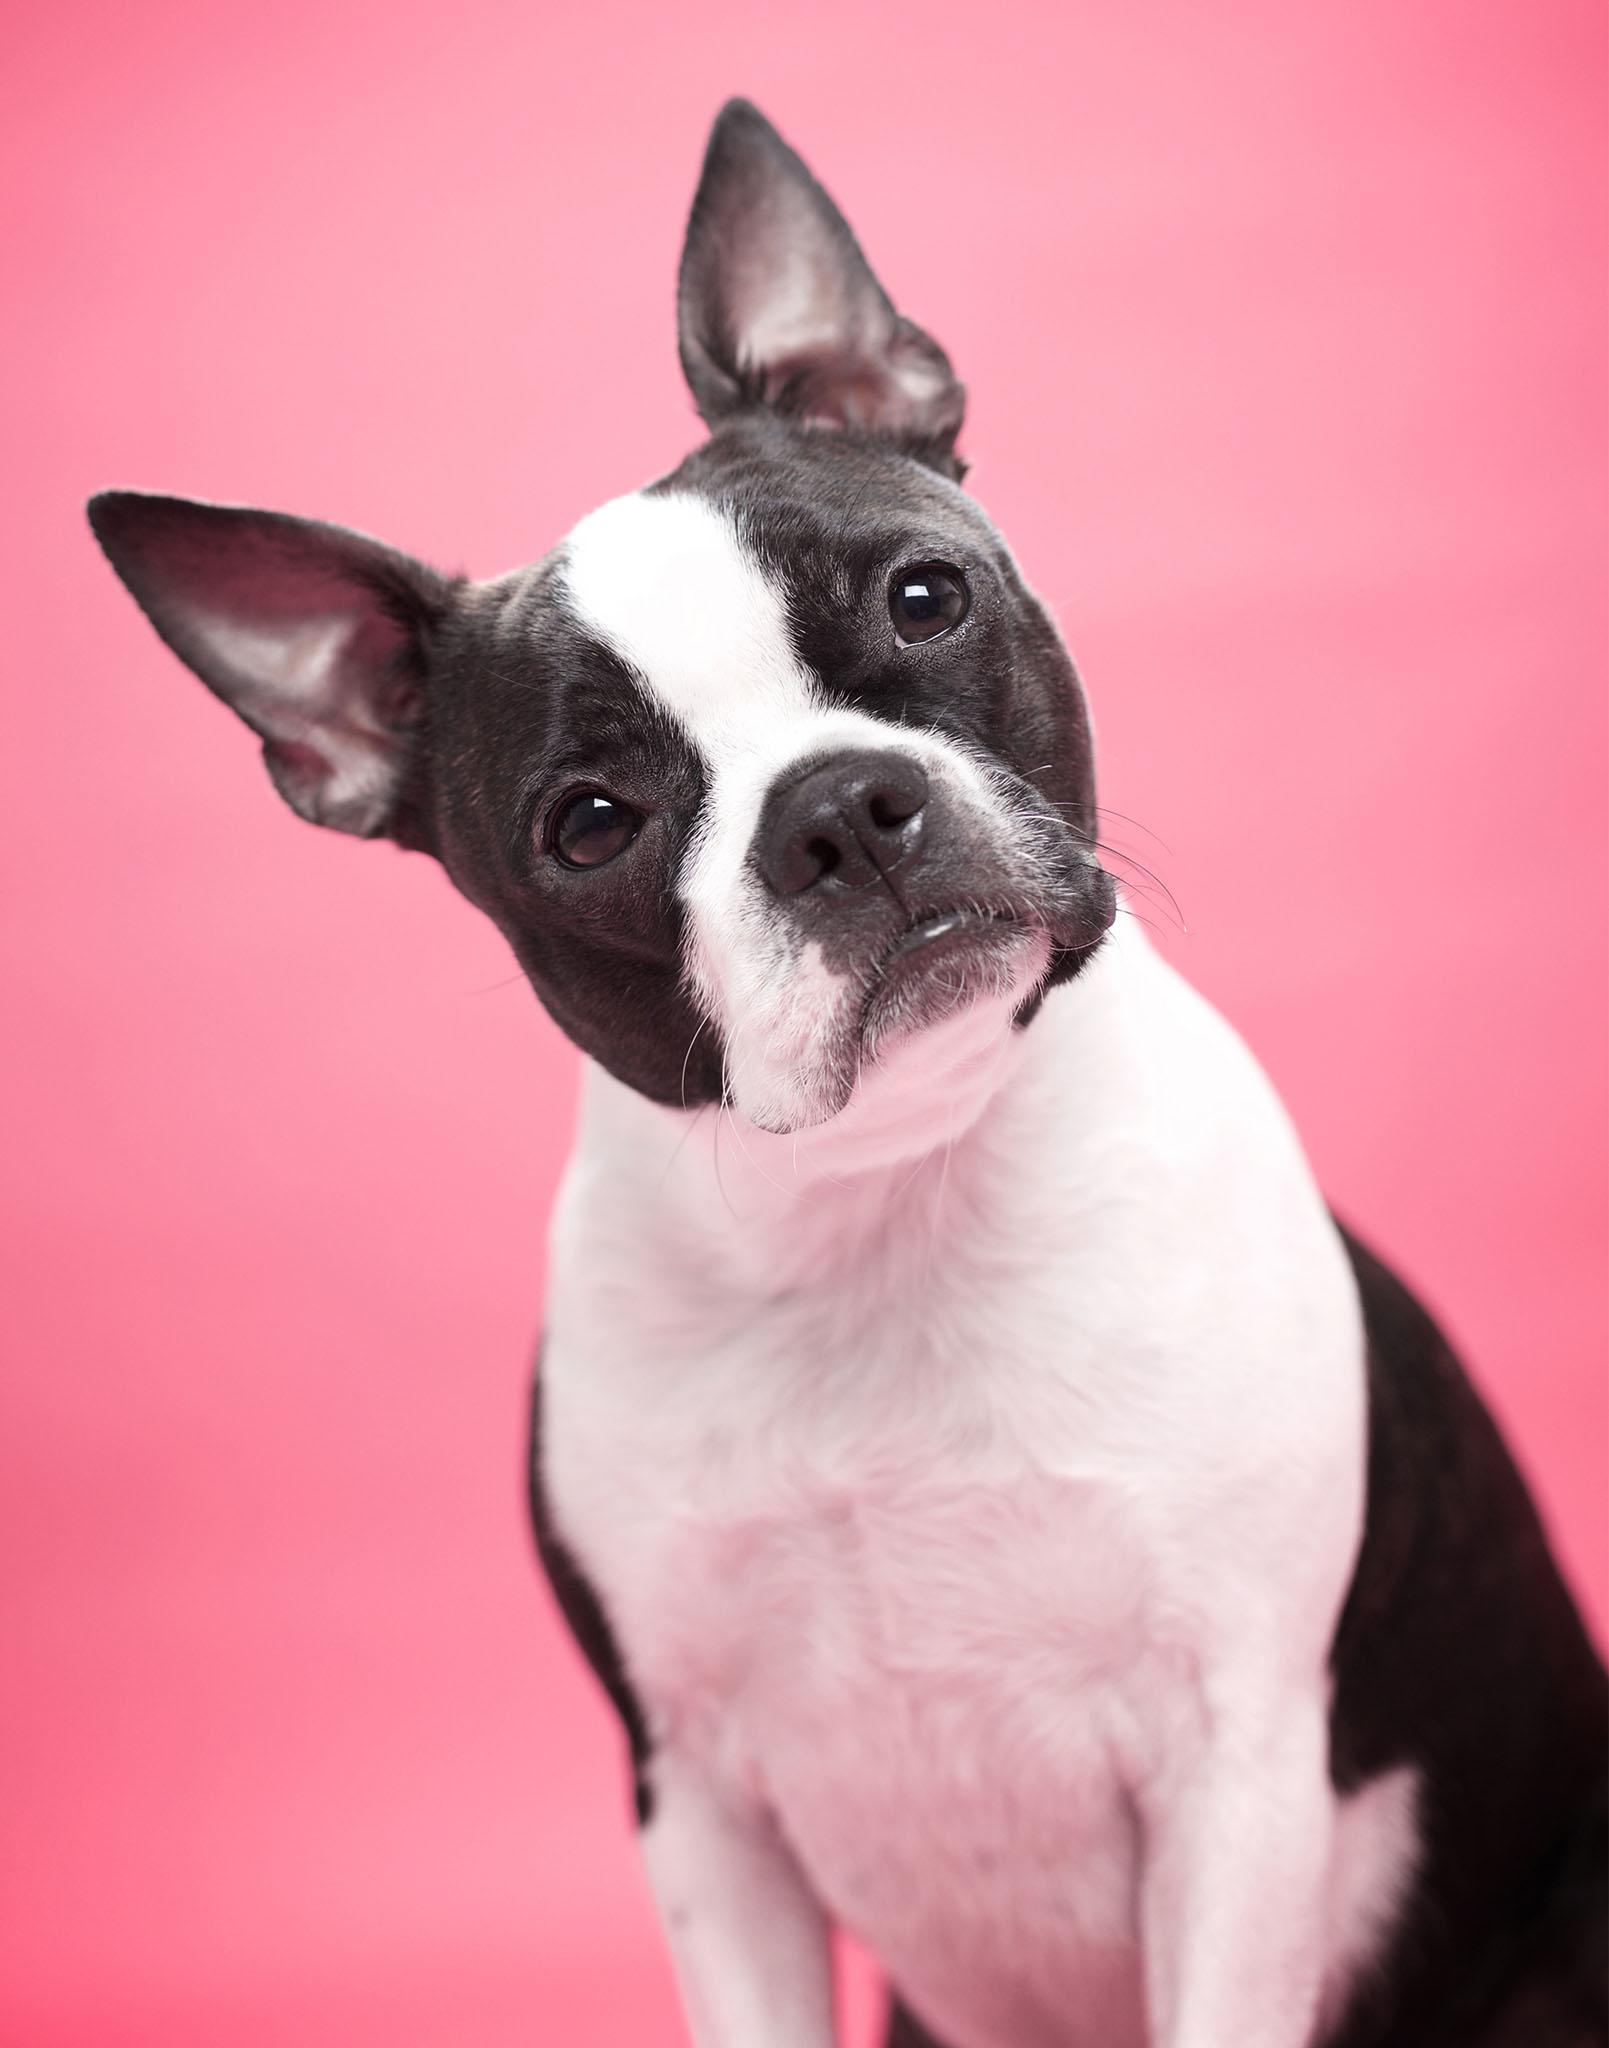 boprey-pet-photography-studio-nyc_18.jpg